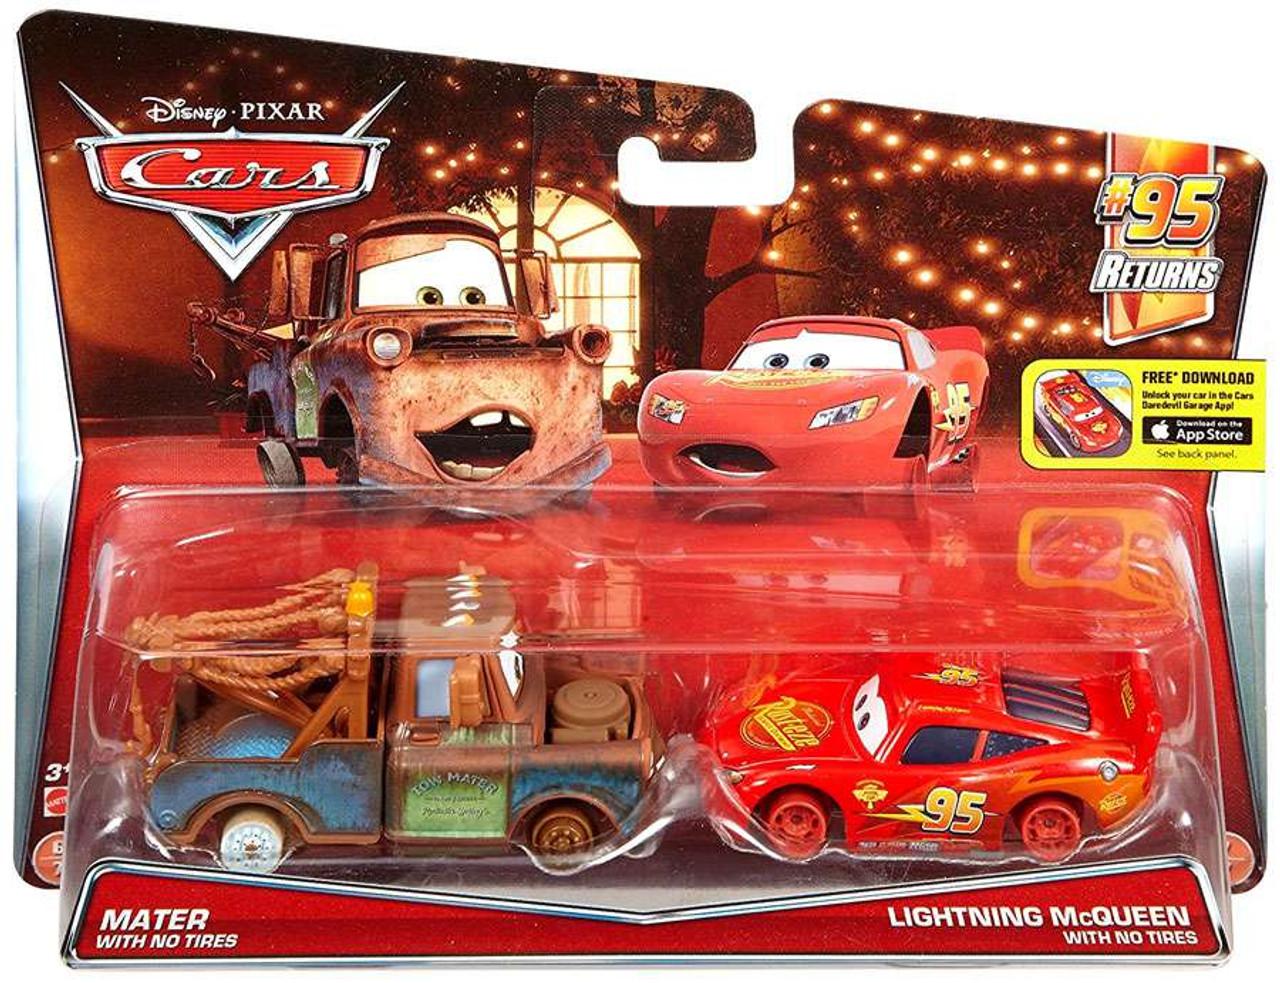 Disney Pixar Cars 95 Returns Mater With No Tires Lightning